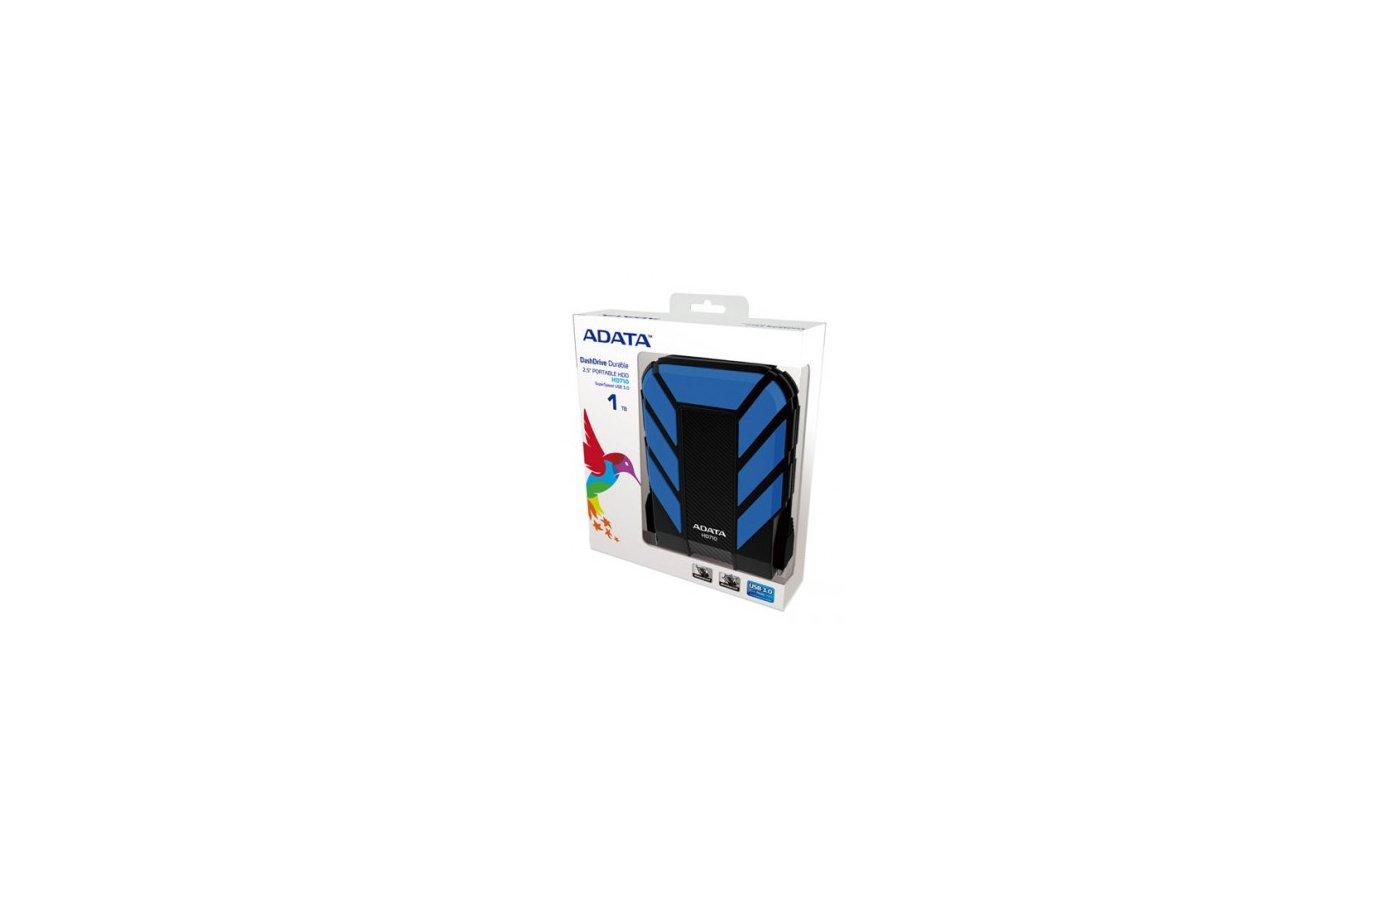 "Внешний жесткий диск A-Data USB 3.0 1Tb HD710-1TU3-CBL 2.5"" синий"